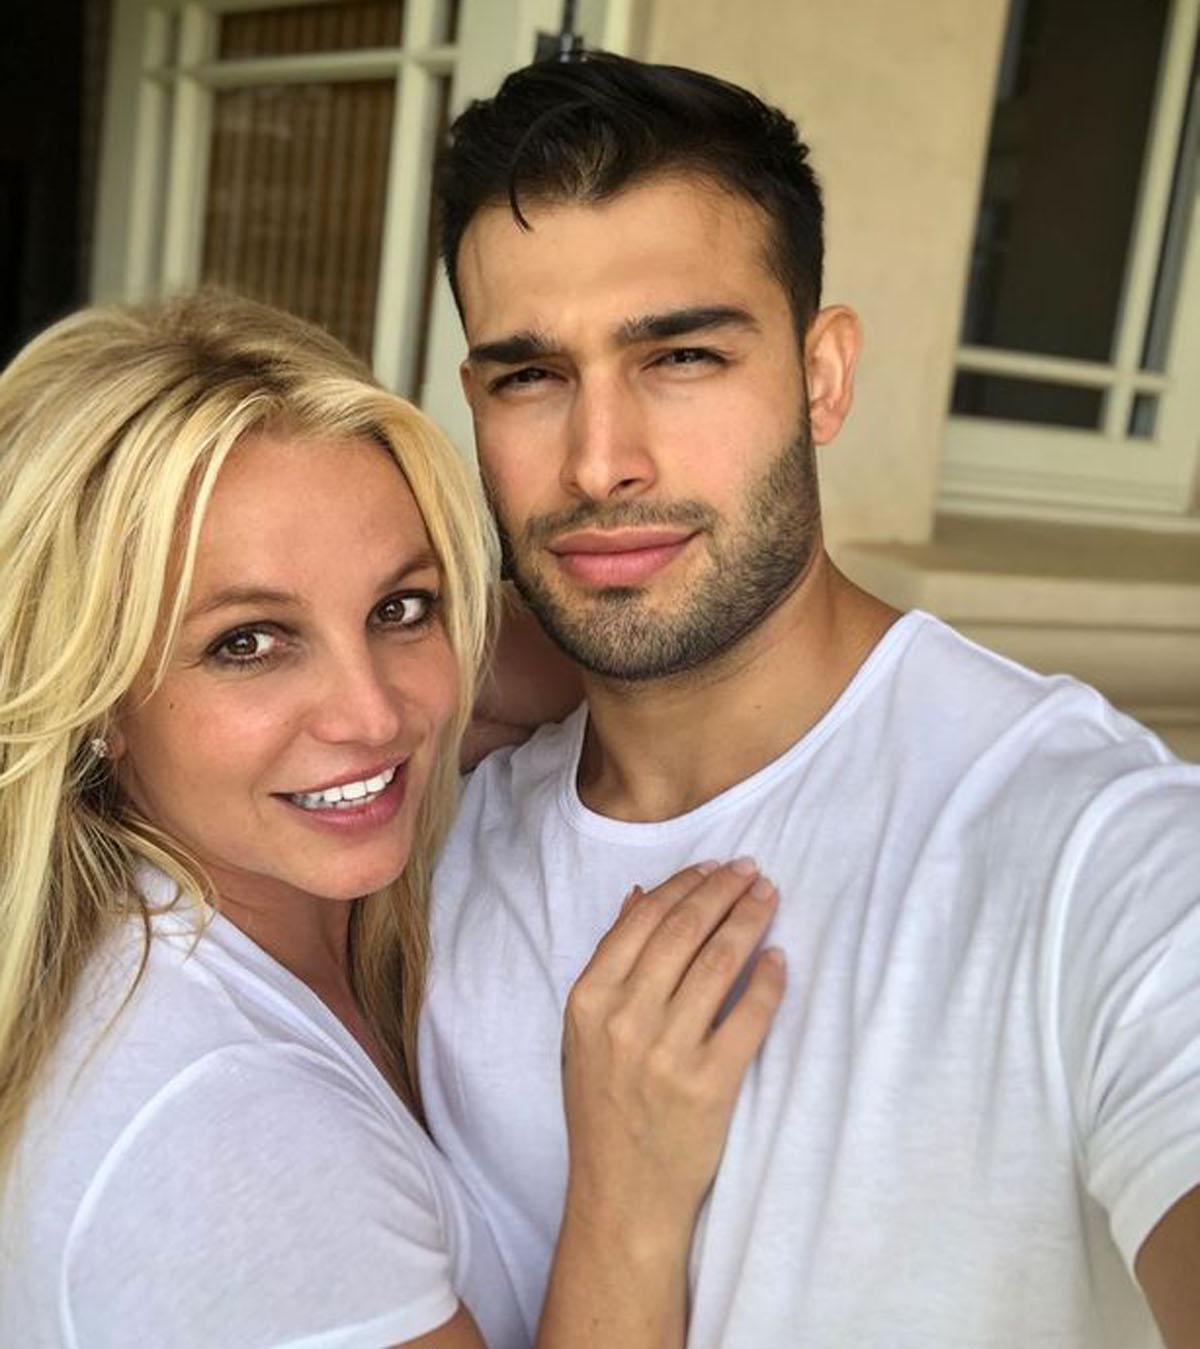 Britney Spears og Sam Asghari (Instagram/samasghari)